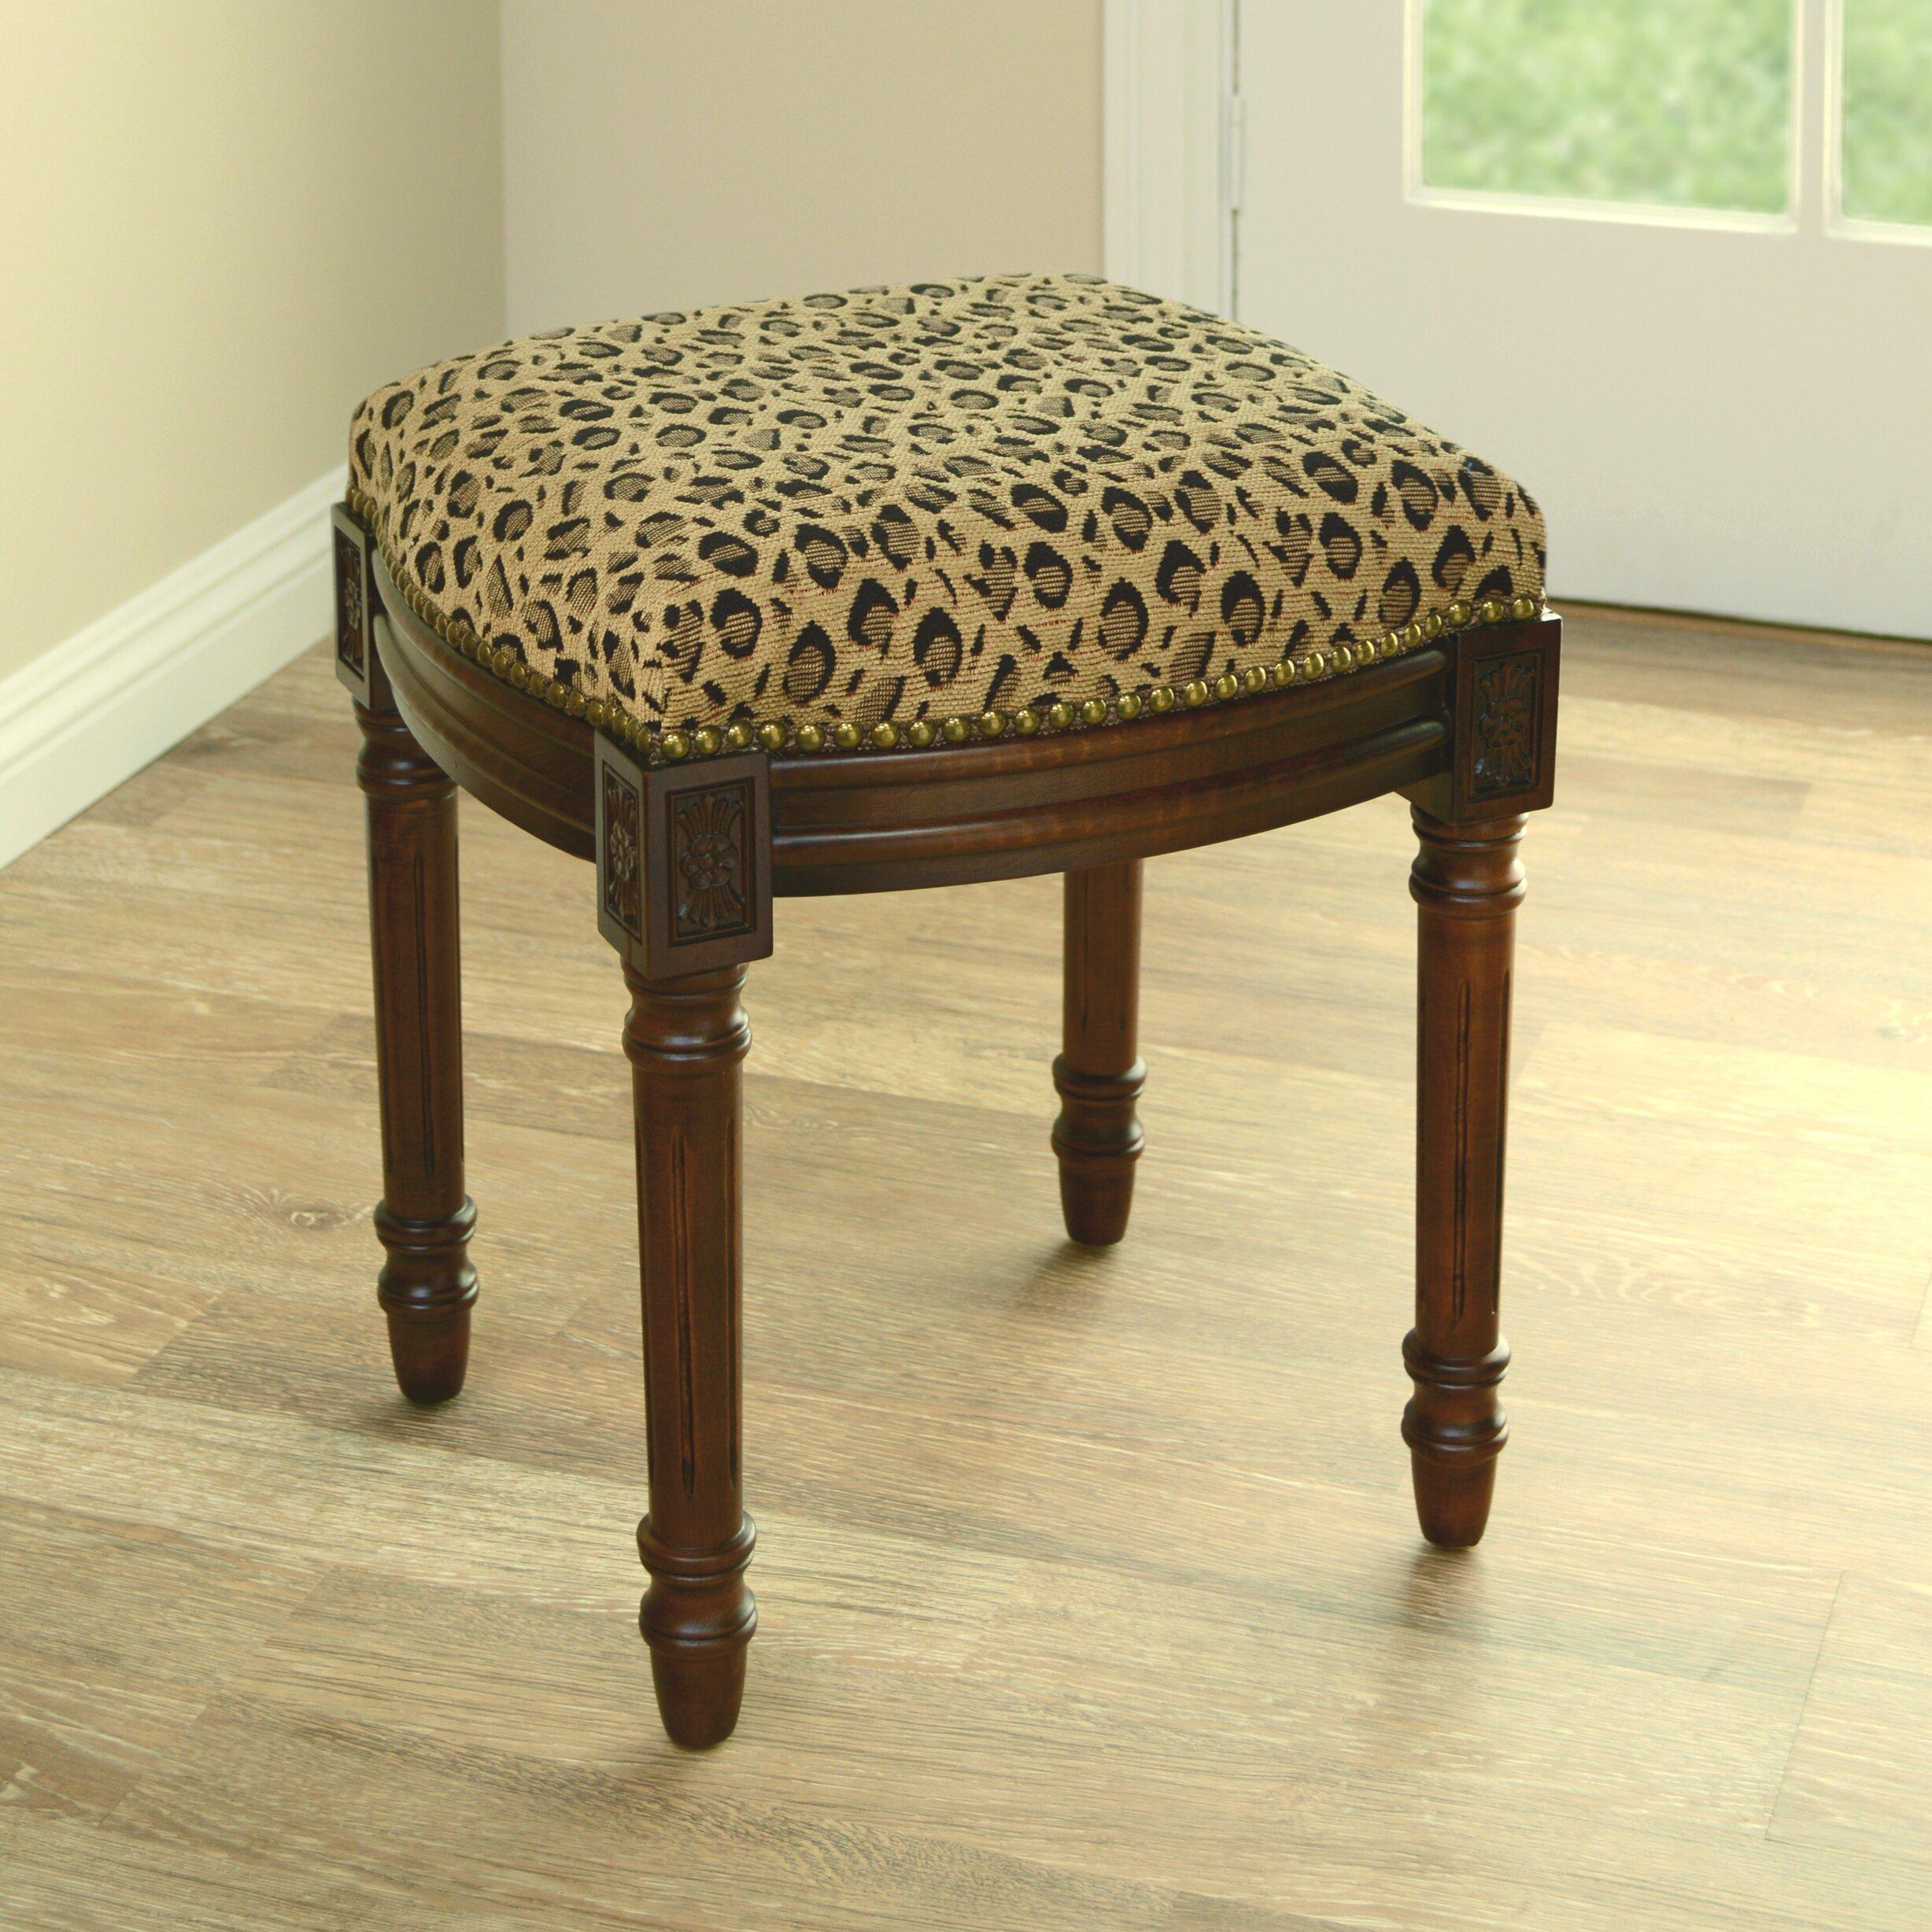 123 Creations Leopard Print Upholstered Vanity Stool